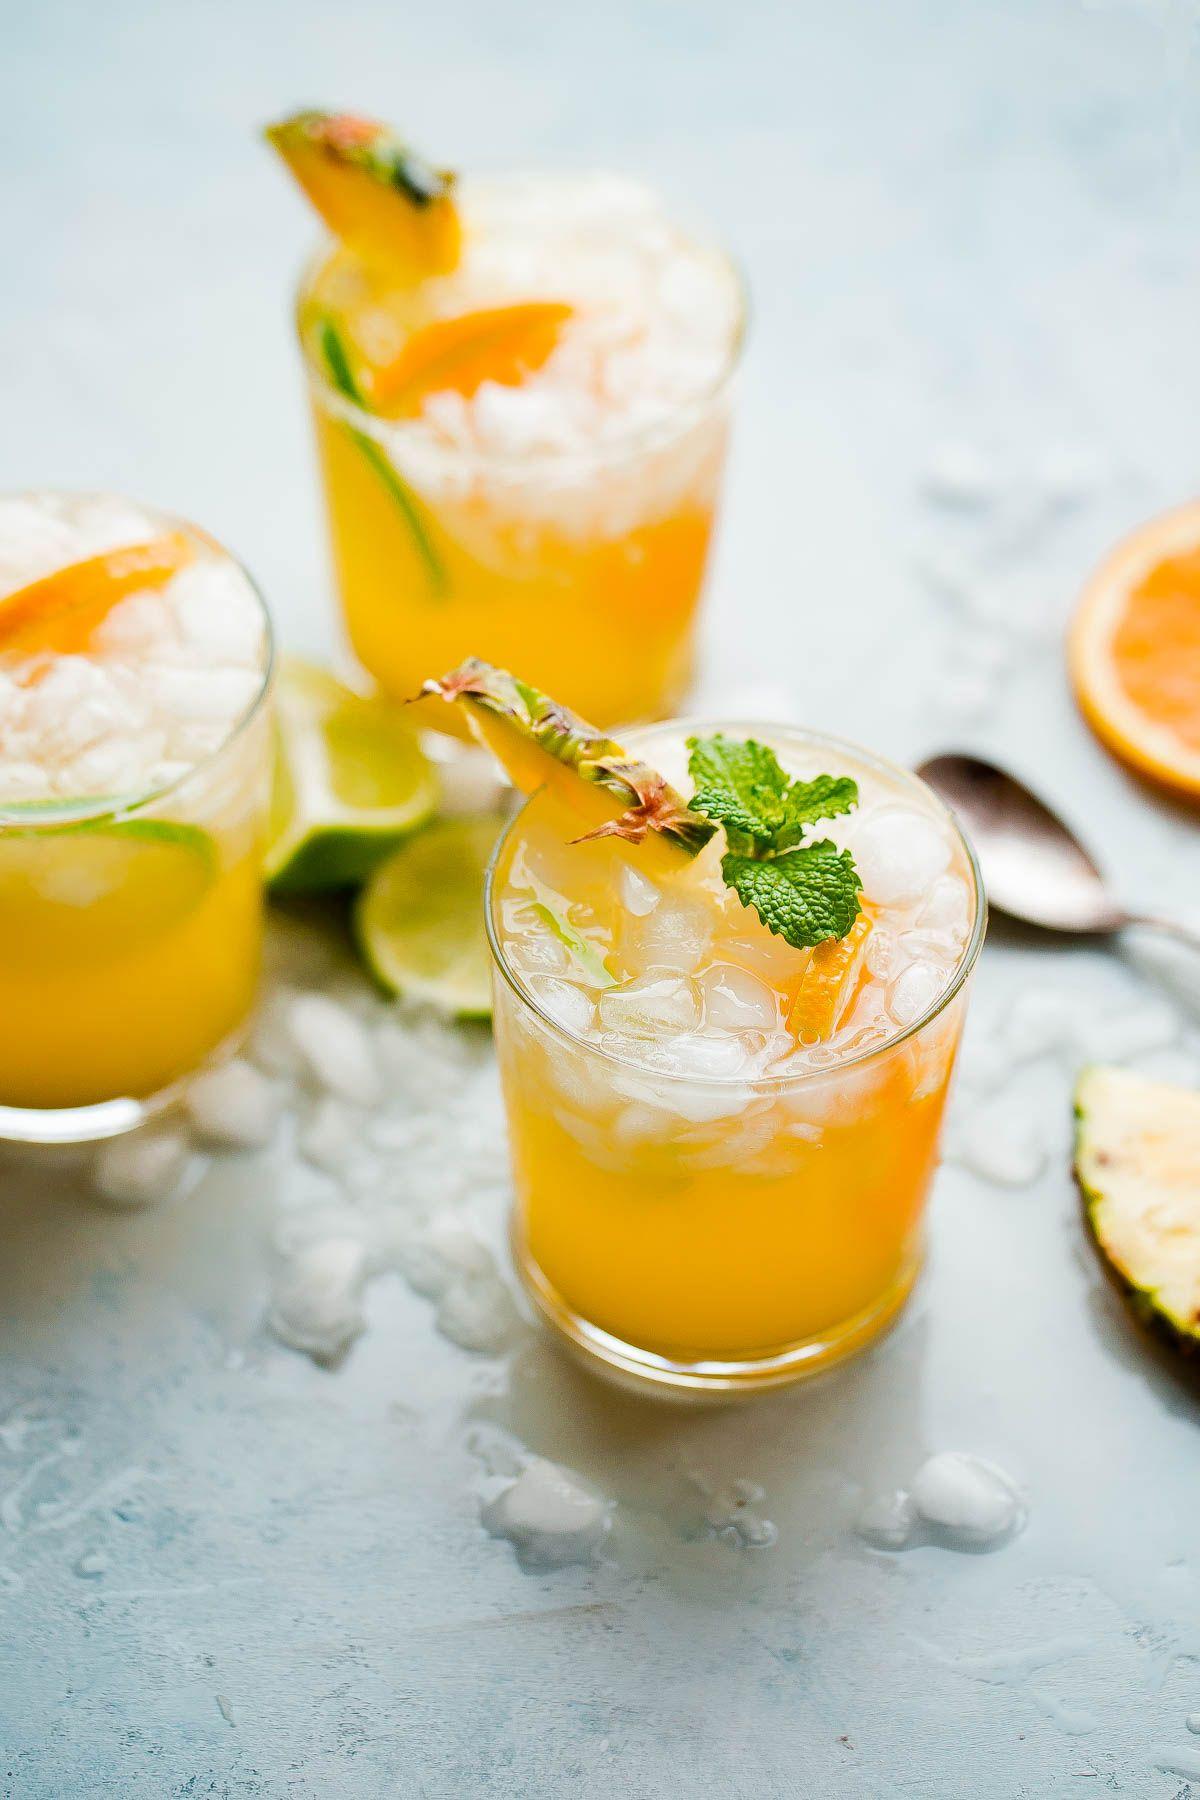 My new favorite drink! Pineapple Punch with Ginger Beer https://t.co/h95x0lzaIh via @abeautifulplate https://t.co/AKyePBpjjU